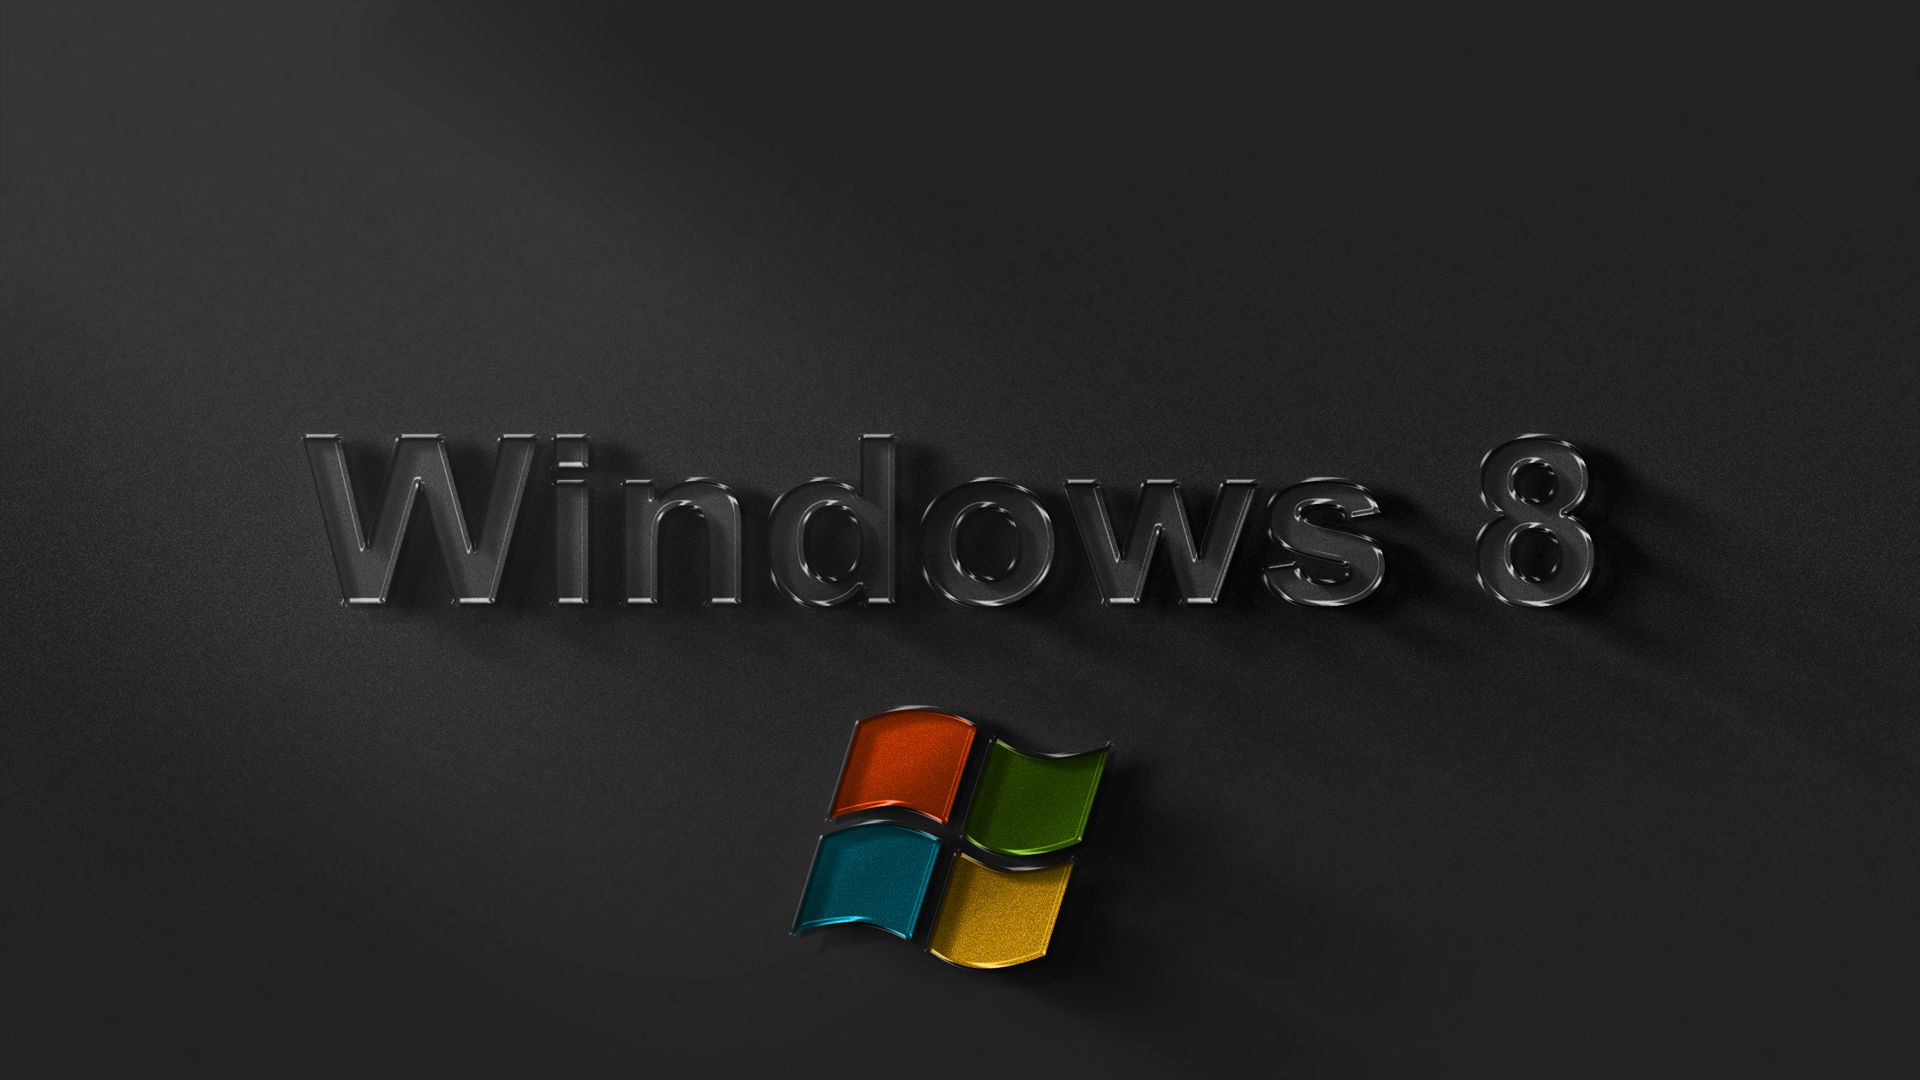 Wallpaper Windows 8